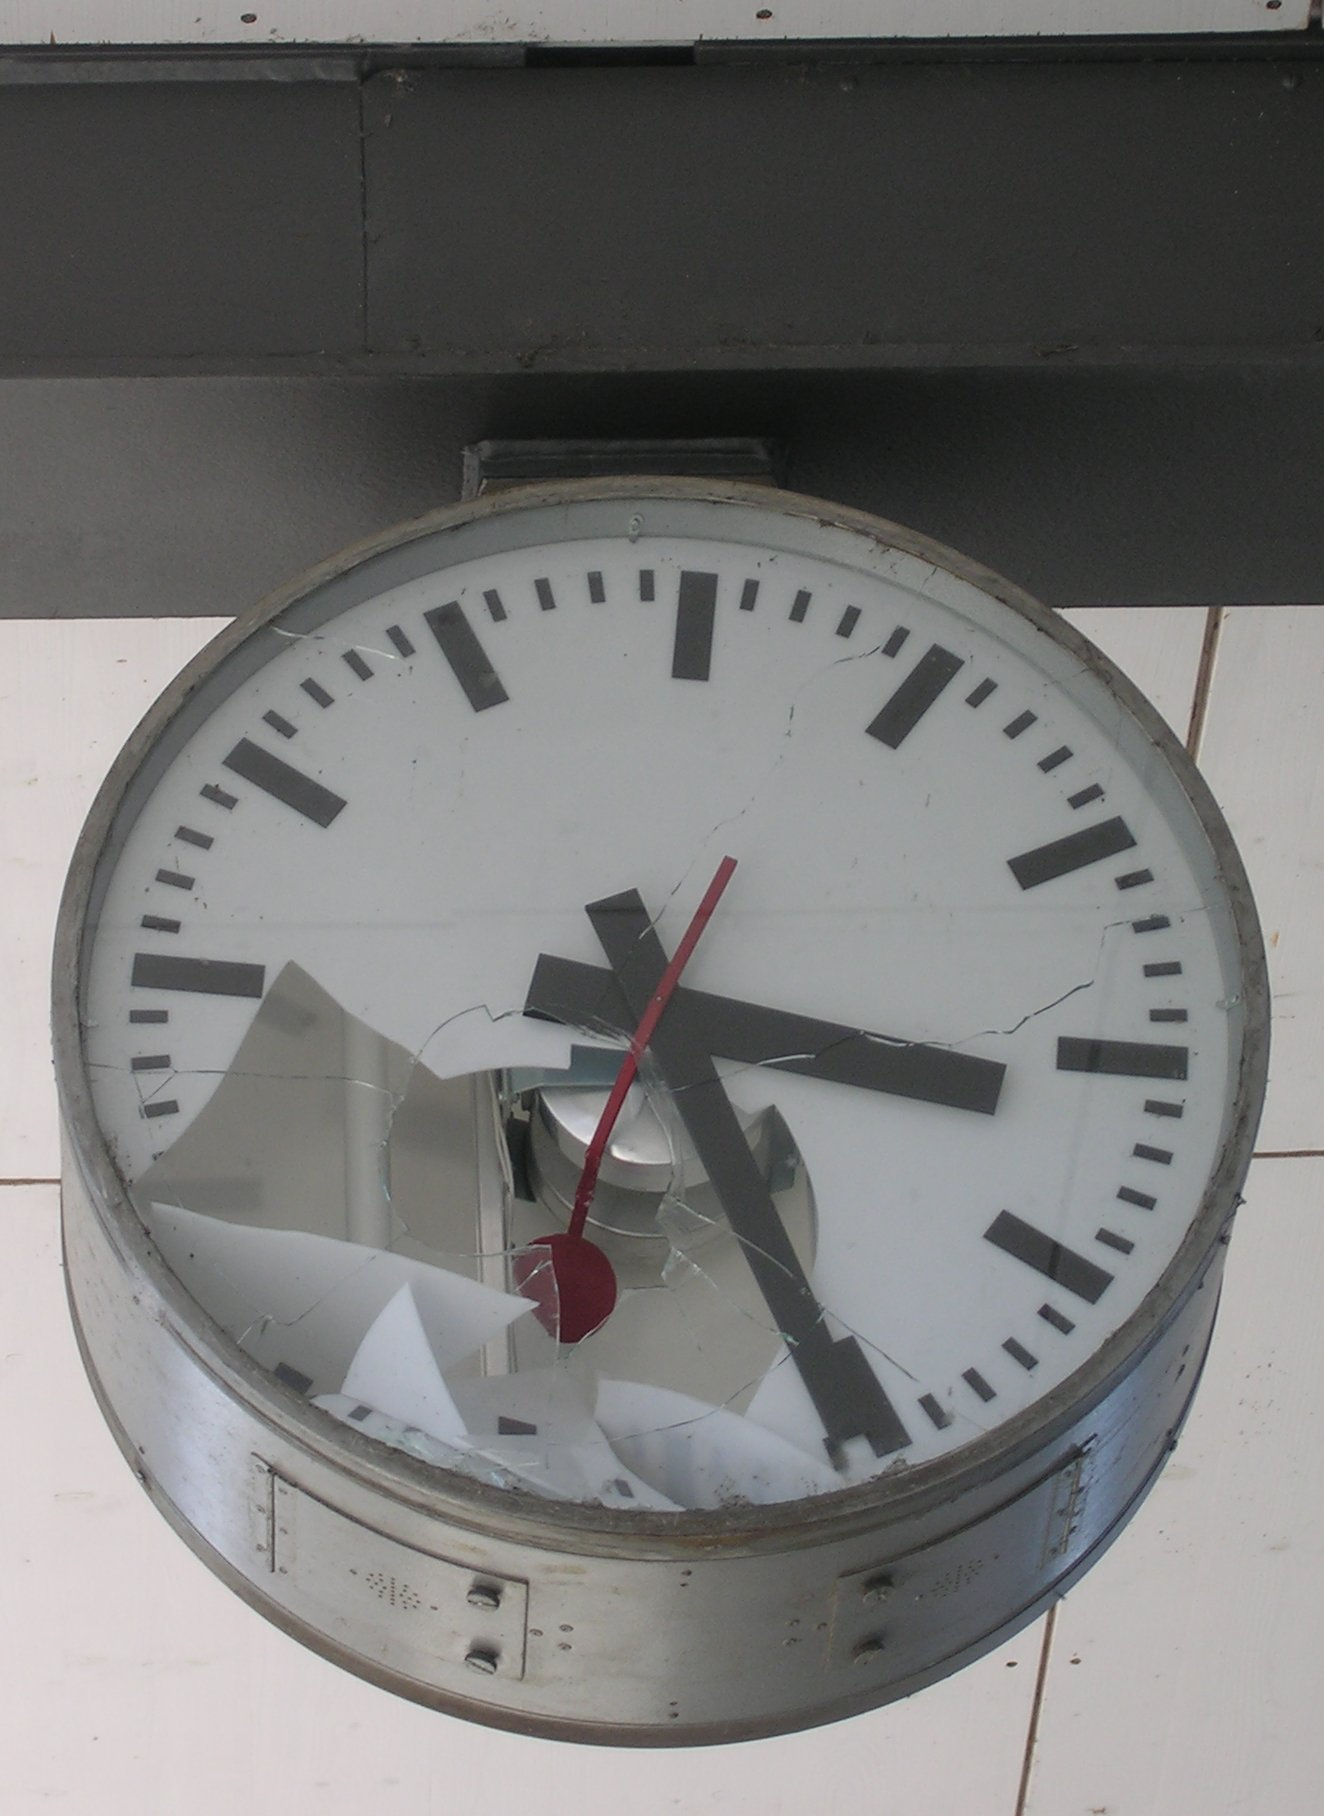 Broken station clock as the illustration or th...